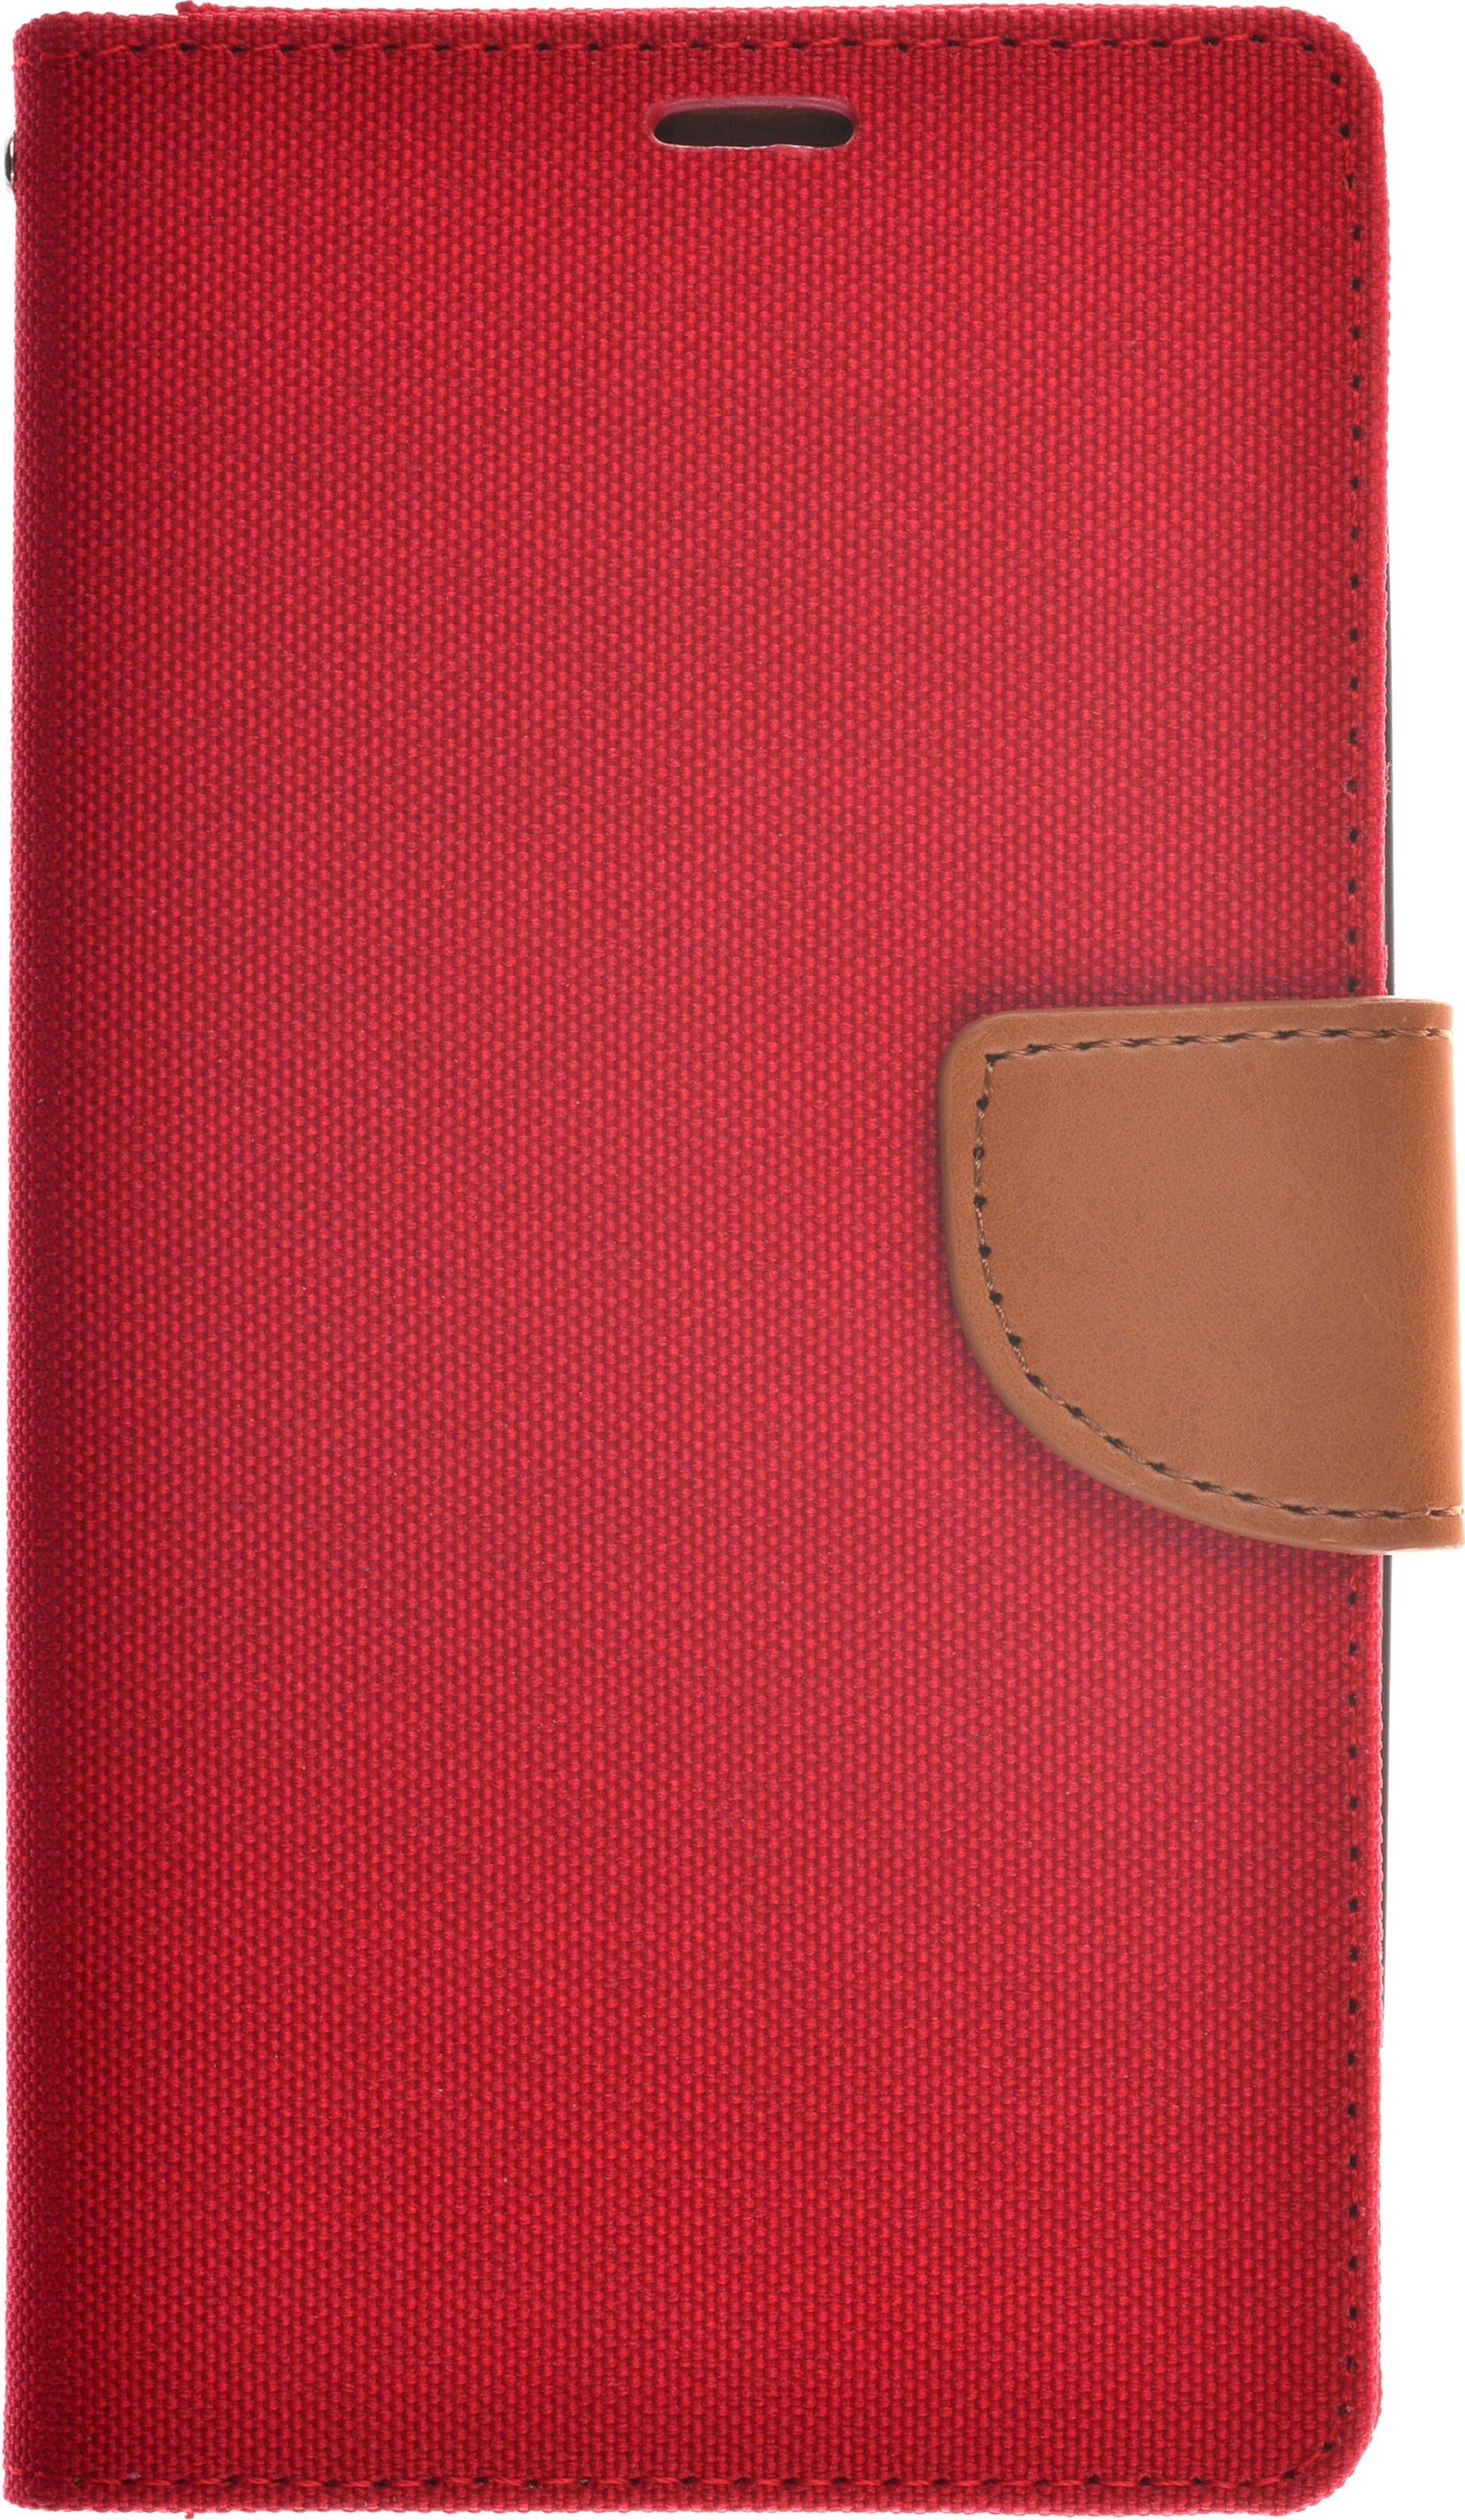 Чехол skinBOX для Asus ZE550KL, 2000000087085, красный roar aw чехол для asus zenfone 4 a400cg white